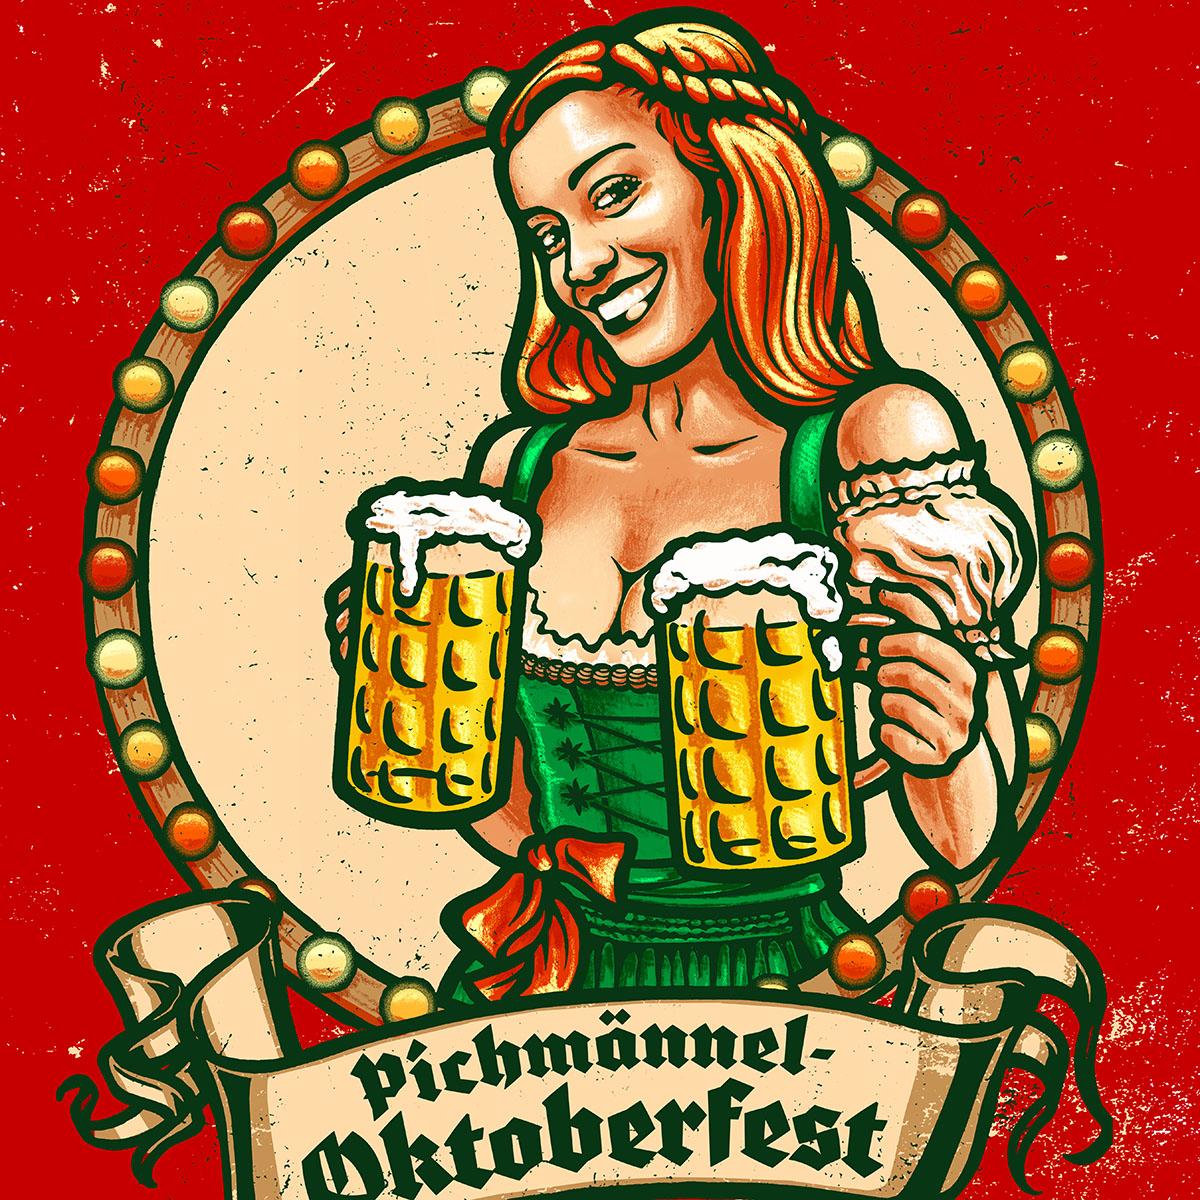 Pichmännel Oktoberfest